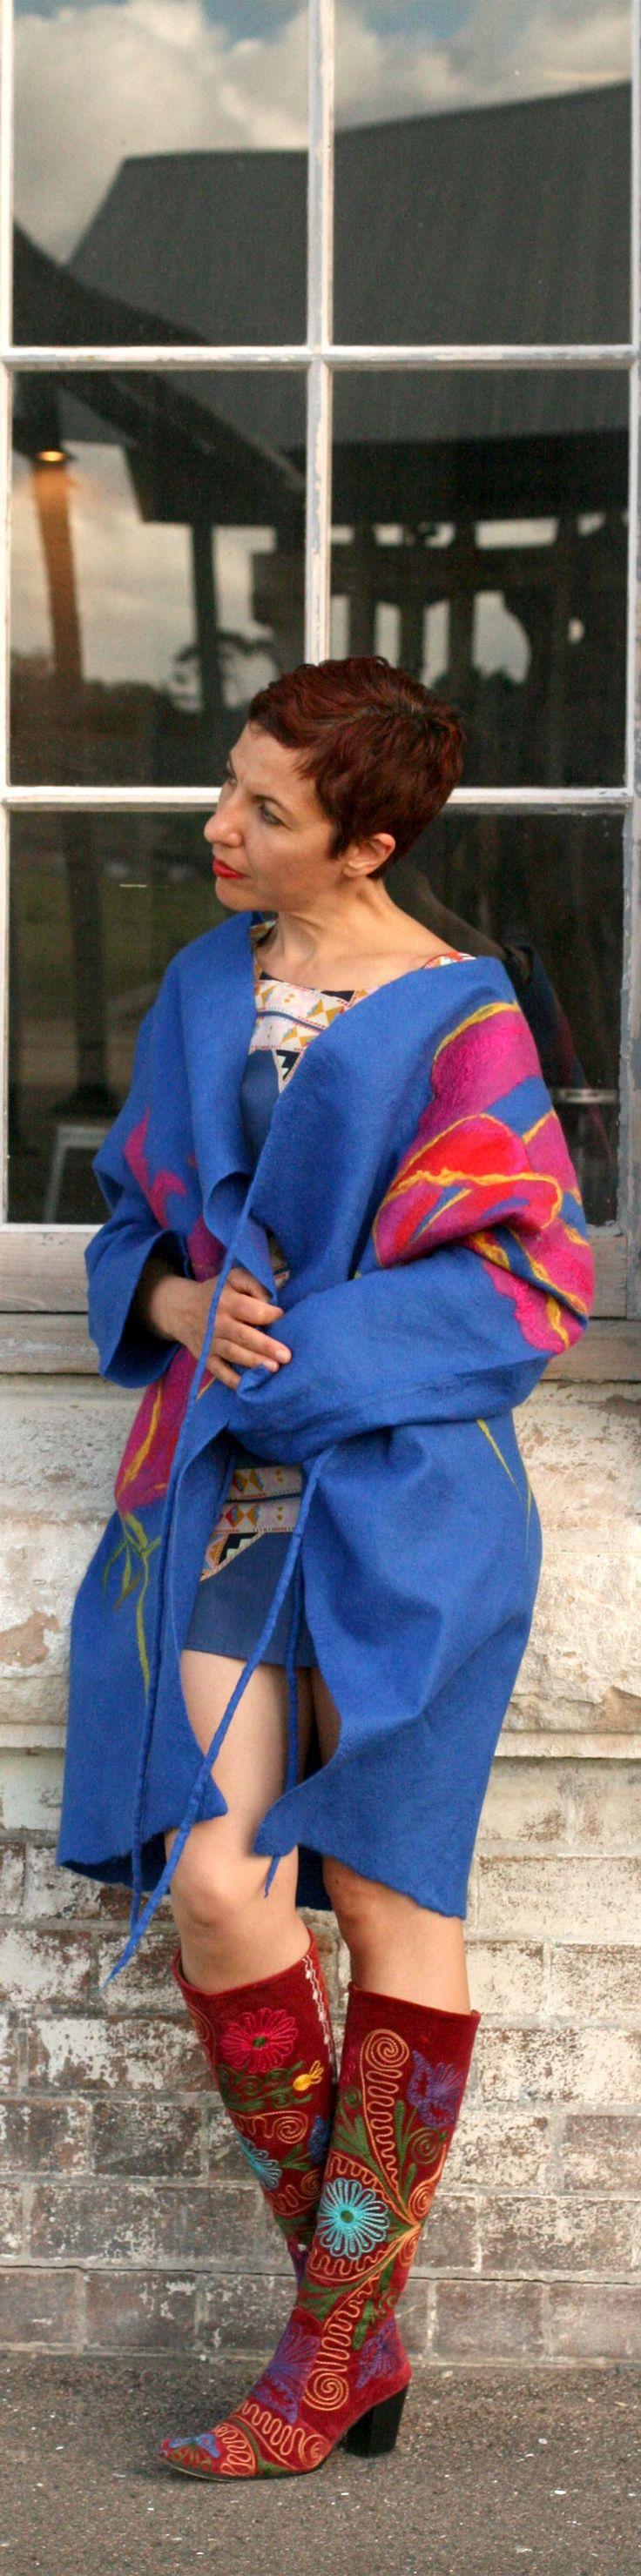 Buy fashion style felted wool blue jacket by Vera Alexanderova #fashion #womensfashion #eco #ecofriendly #ecofashion #felted #blue #coat #jacket